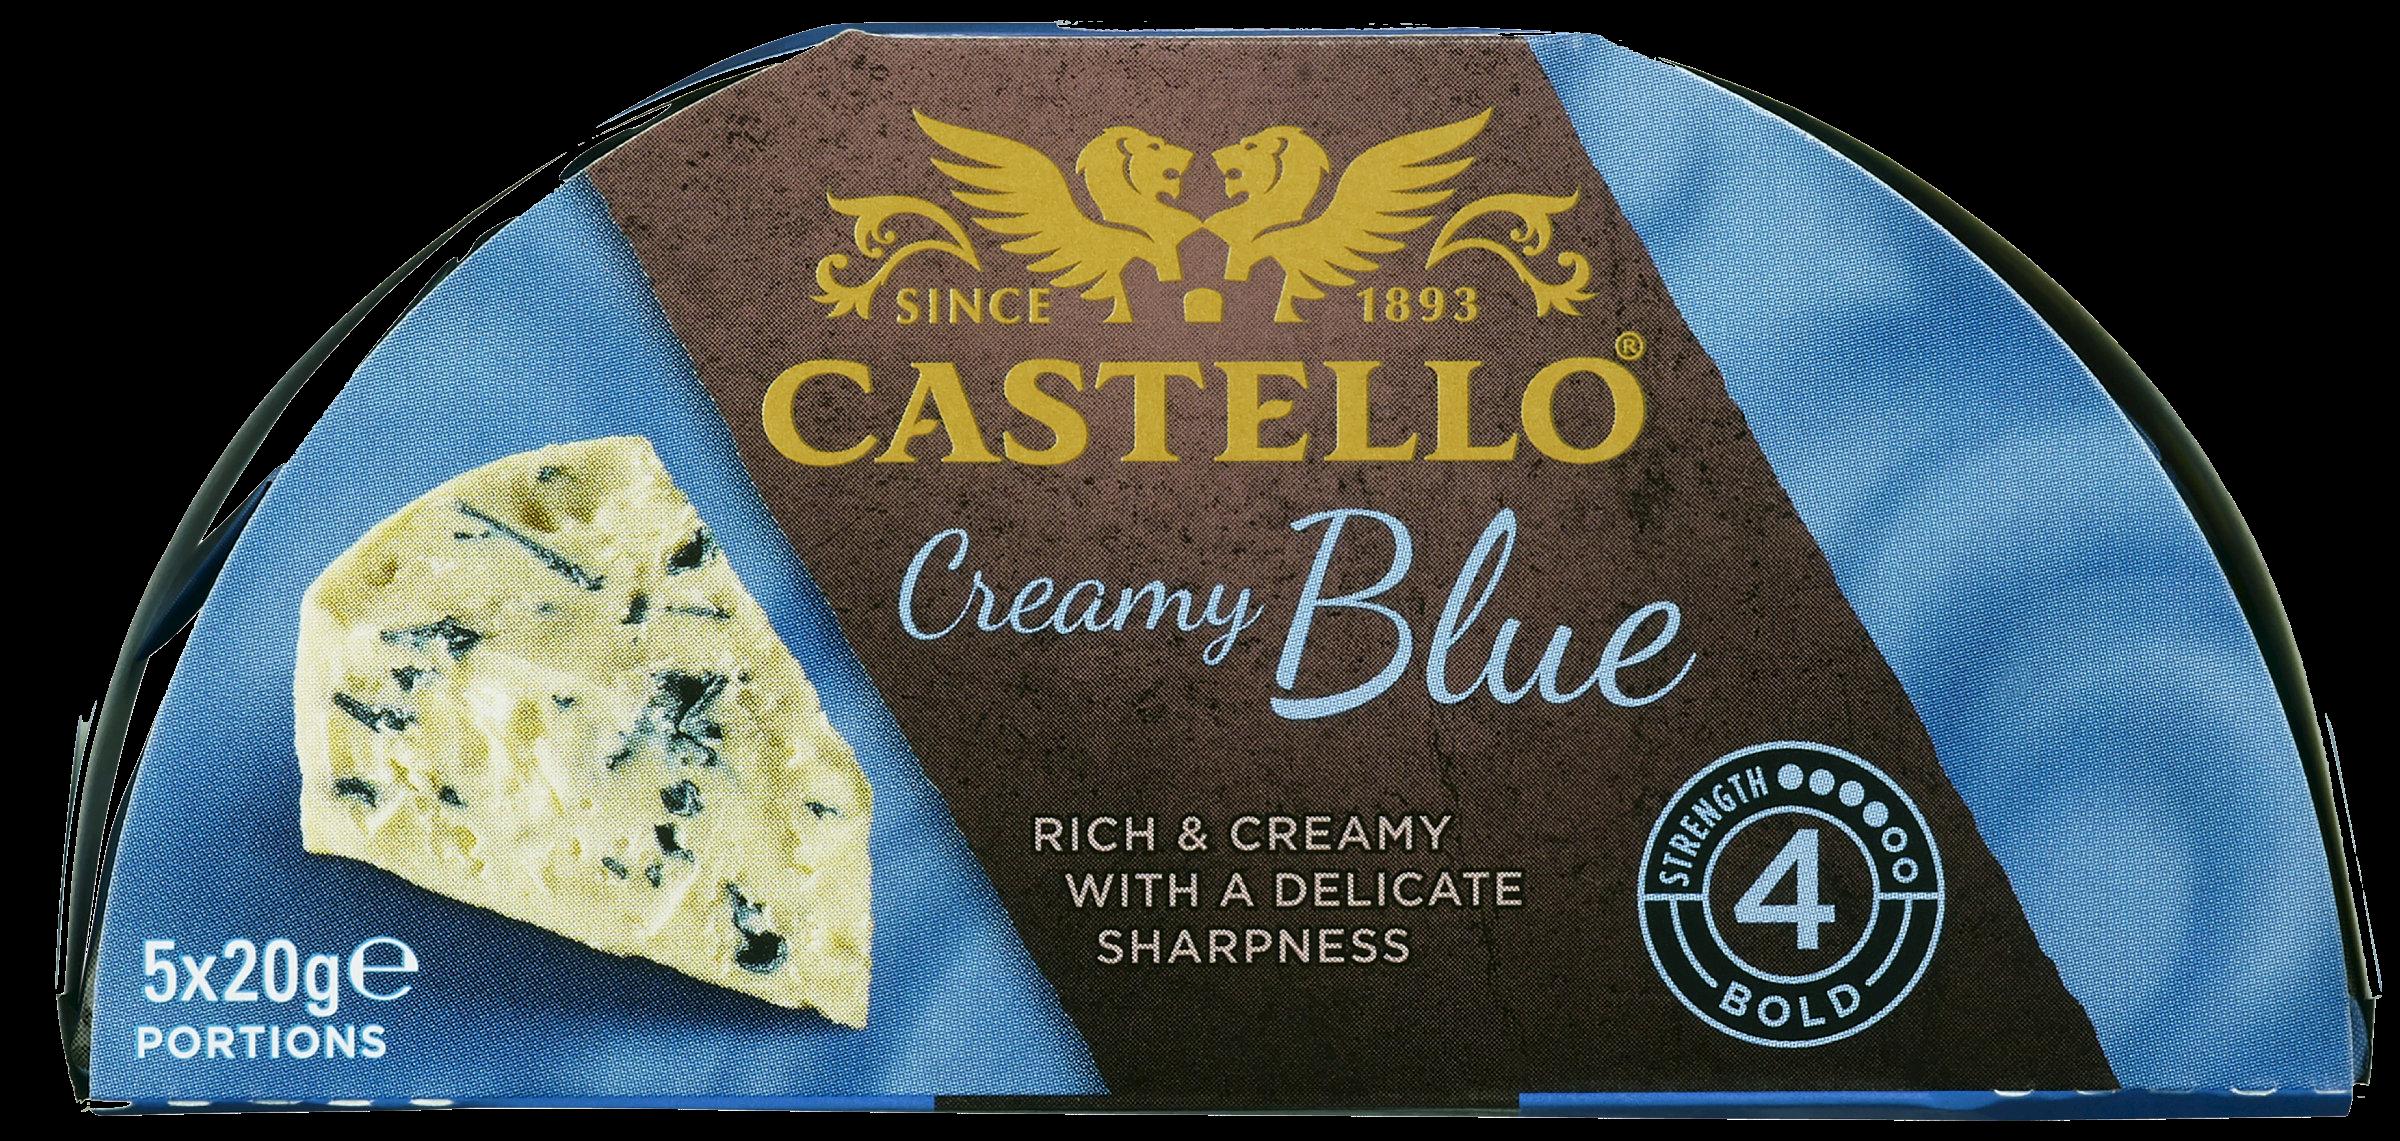 Castello® Creamy Blue Portion Pack